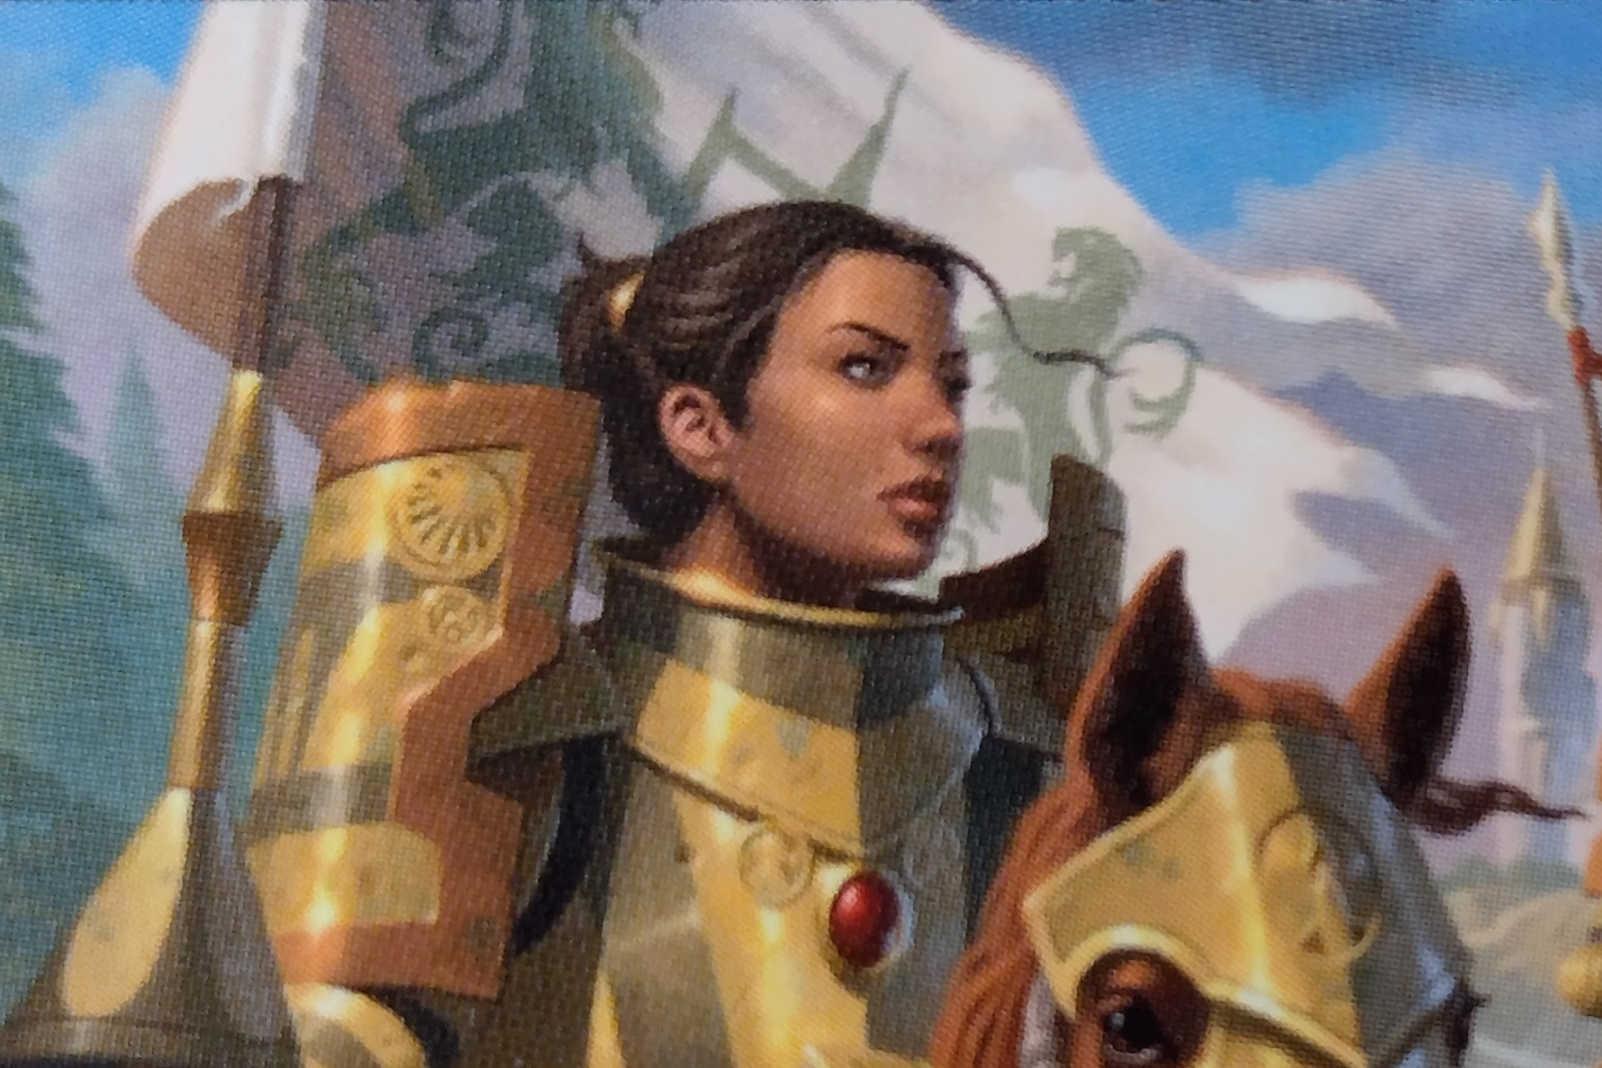 MtG vigilance card gallant cavalry